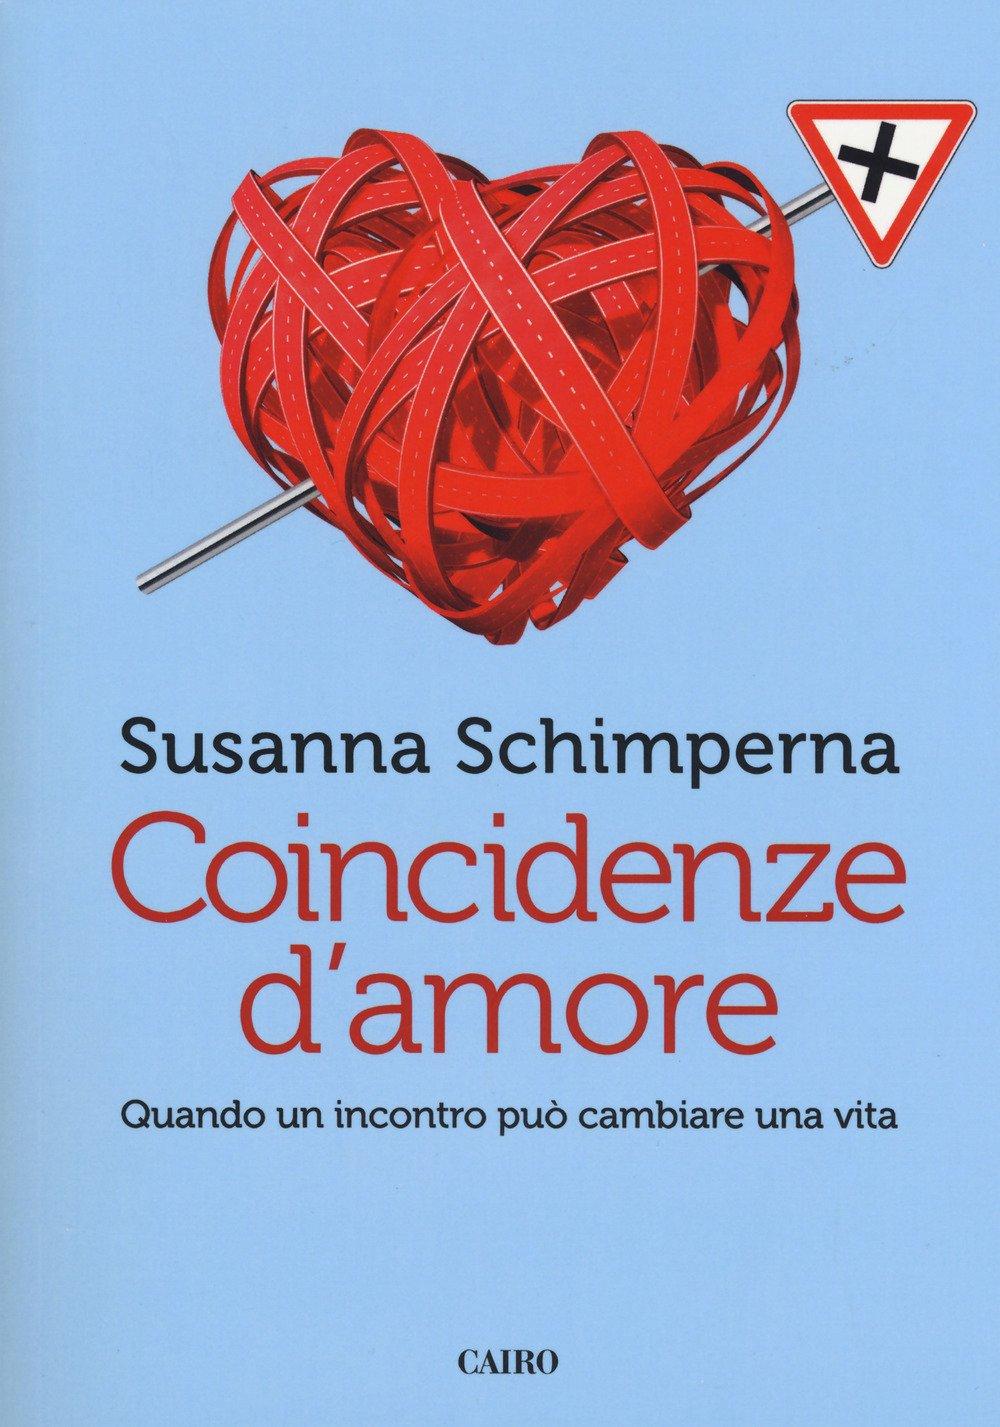 Susanna Schimperna